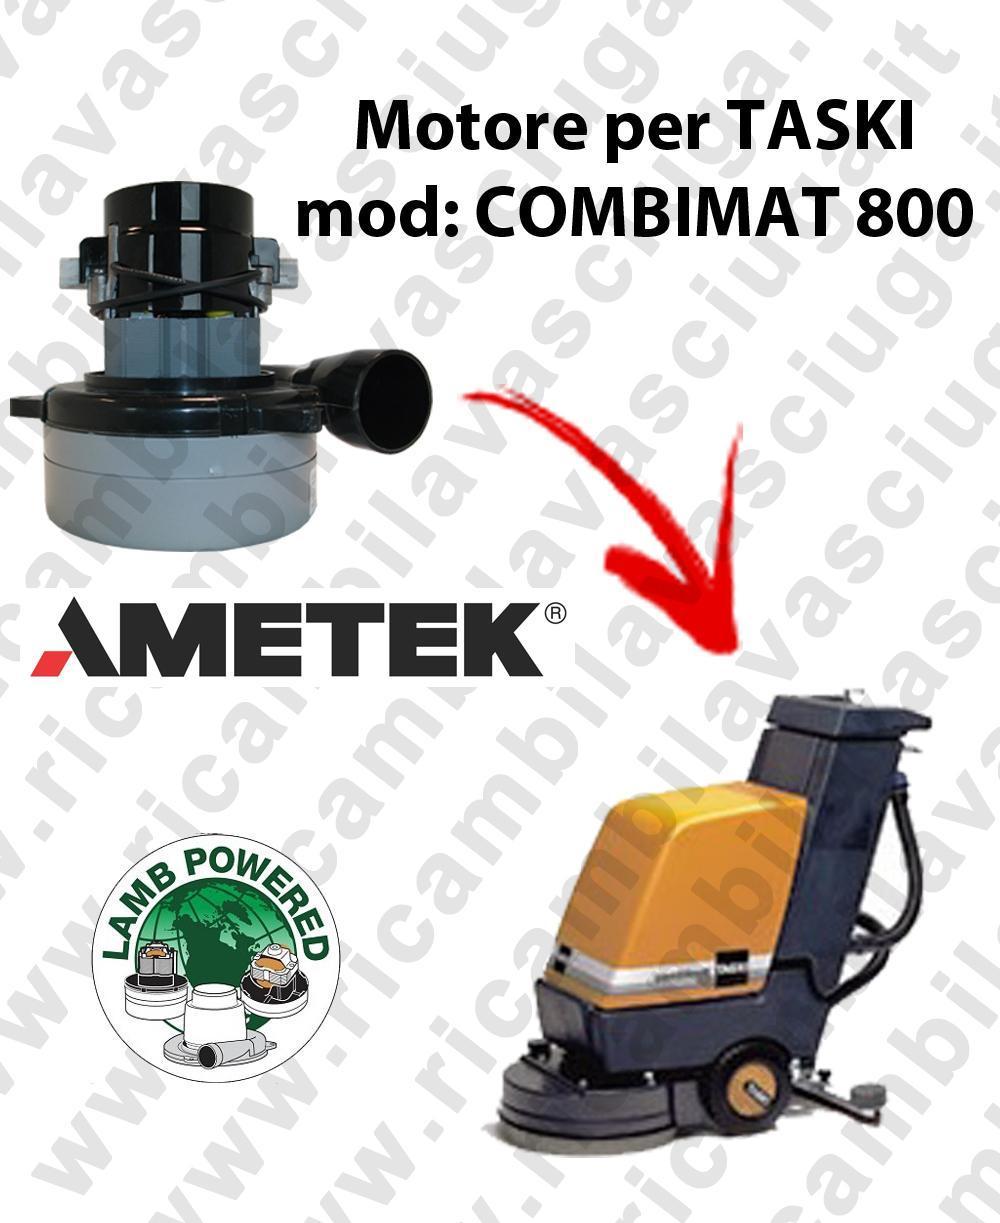 COMBIMAT 800 Saugmotor LAMB AMETEK für scheuersaugmaschinen TASKI